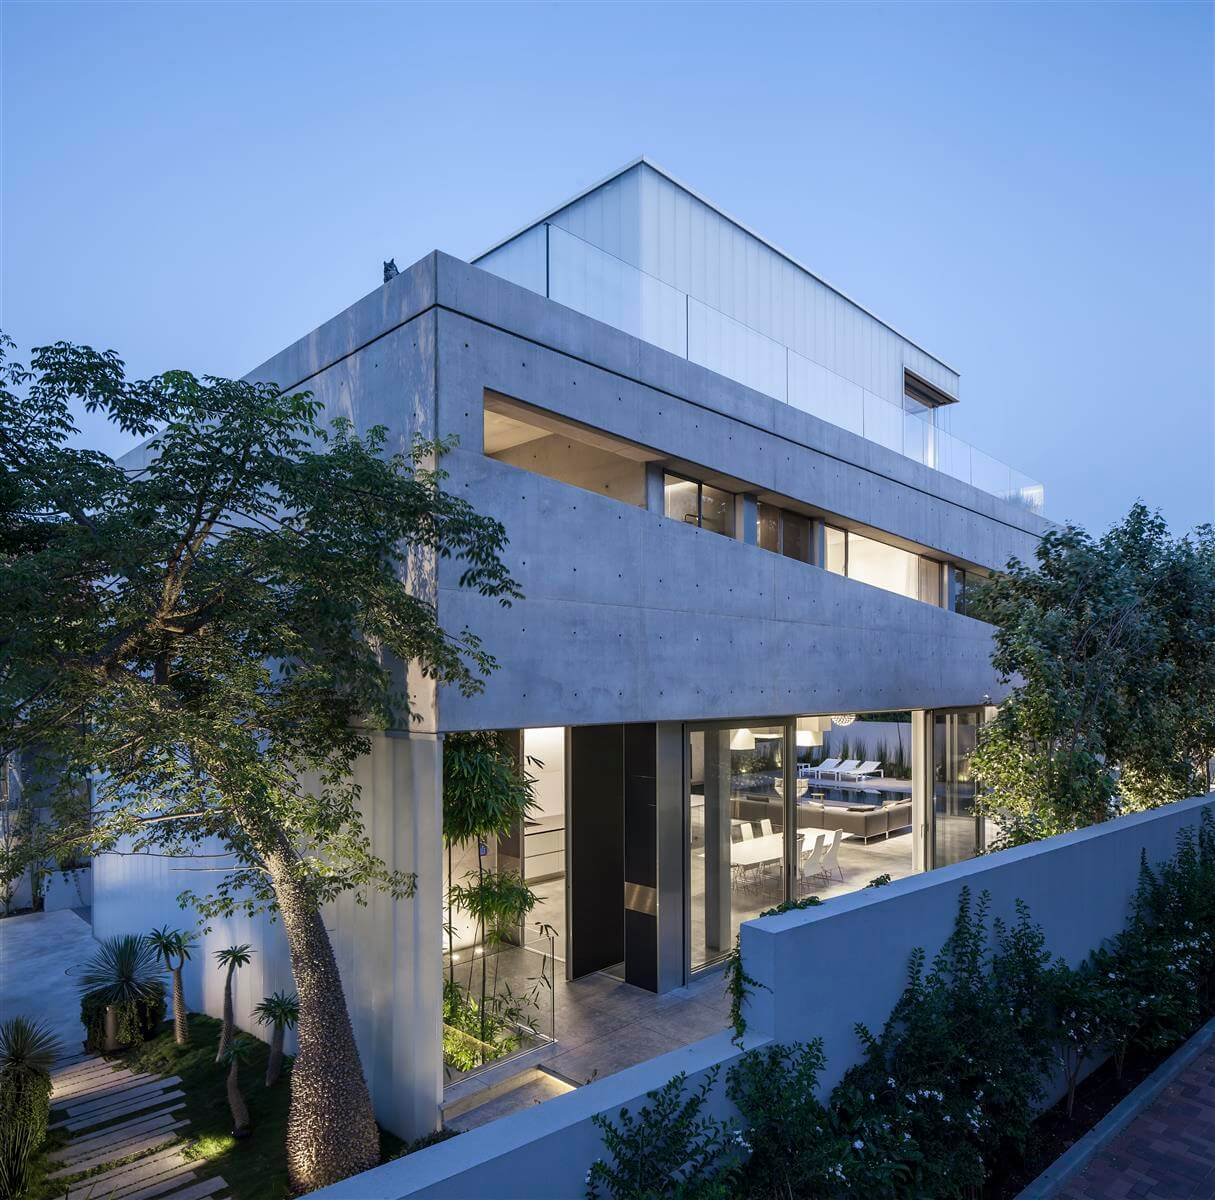 The Concrete Cut House in Ramat Gan by Pitsou Kedem Architects-10